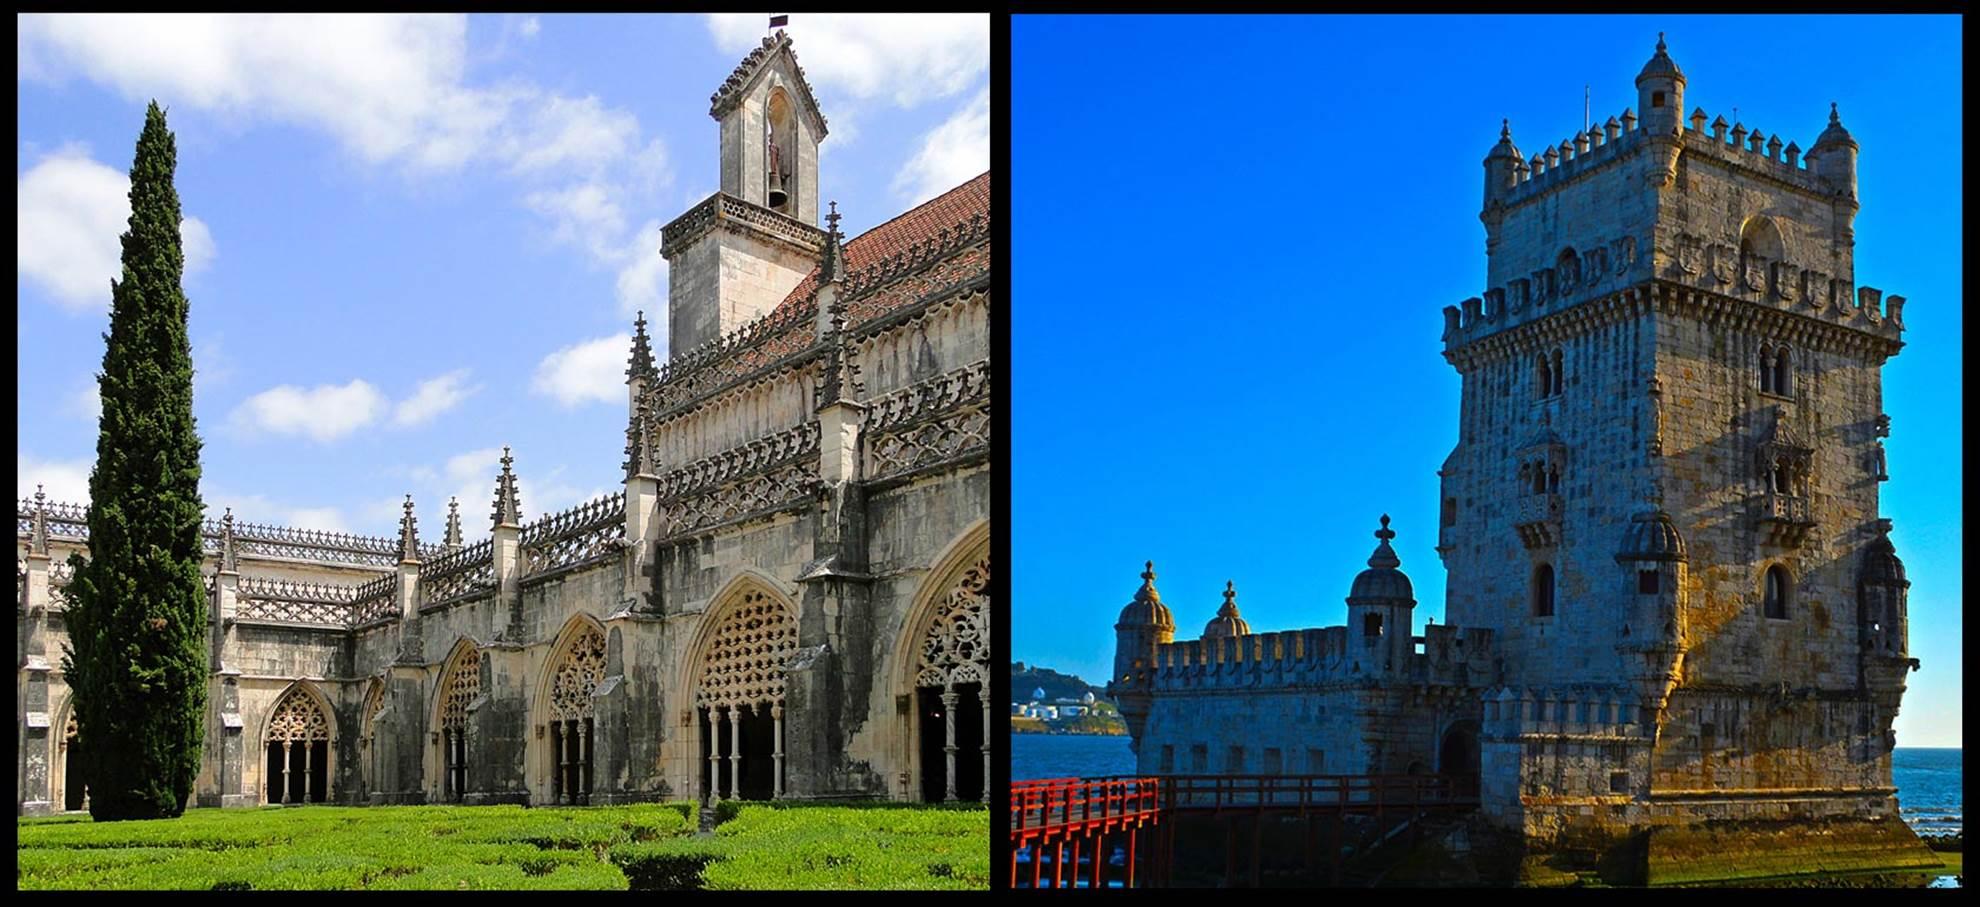 Belém Bundle: Torre Belém + Jeronimos Monastery Skip the line!